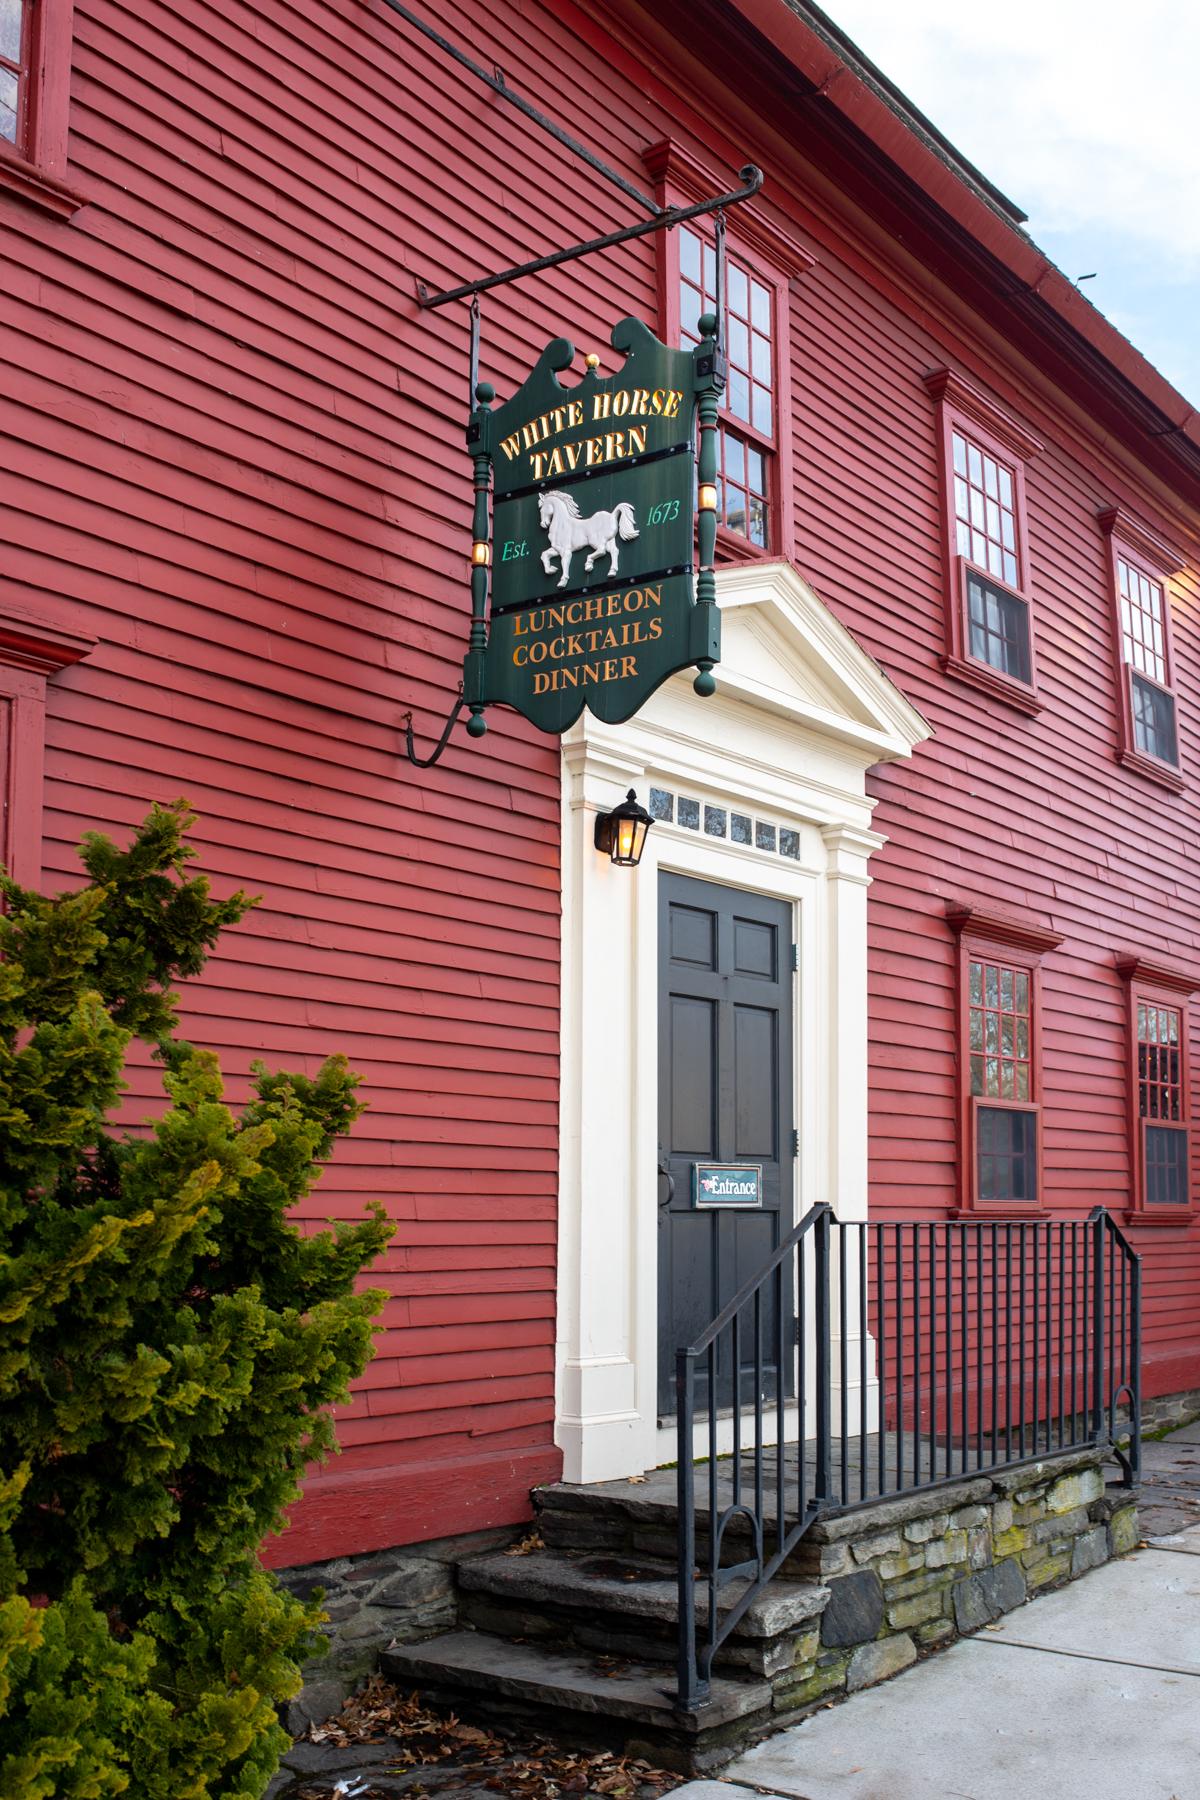 Newport%2C Rhode Island Weekend Travel Guide x Stacie Flinner-70.jpg